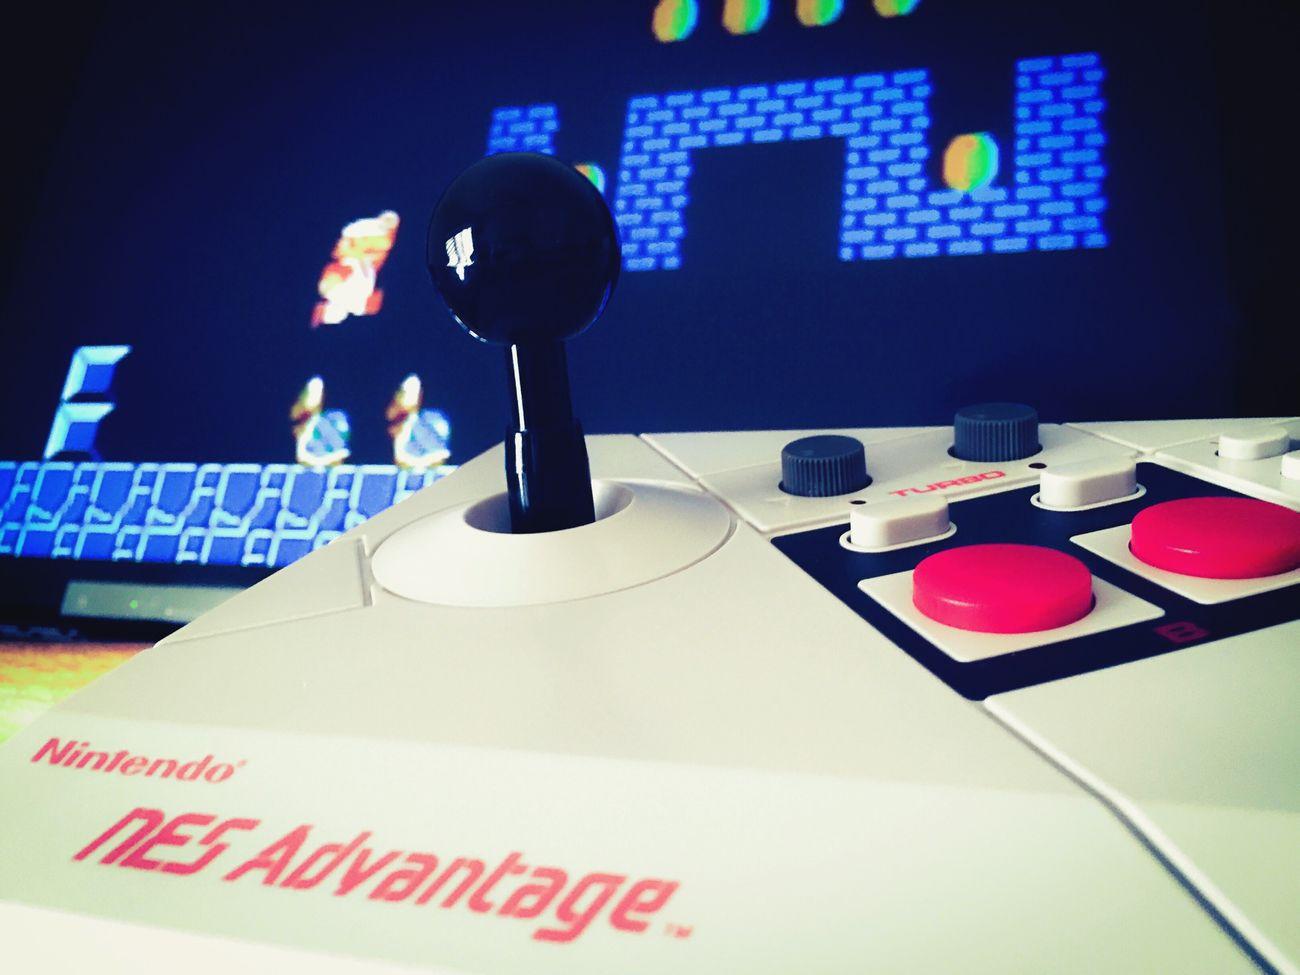 Nintendo Advantage Nes Check This Out Retro Gaming Nostalgic  Nostalgia Super Mario Bros. Gaming Oldschool